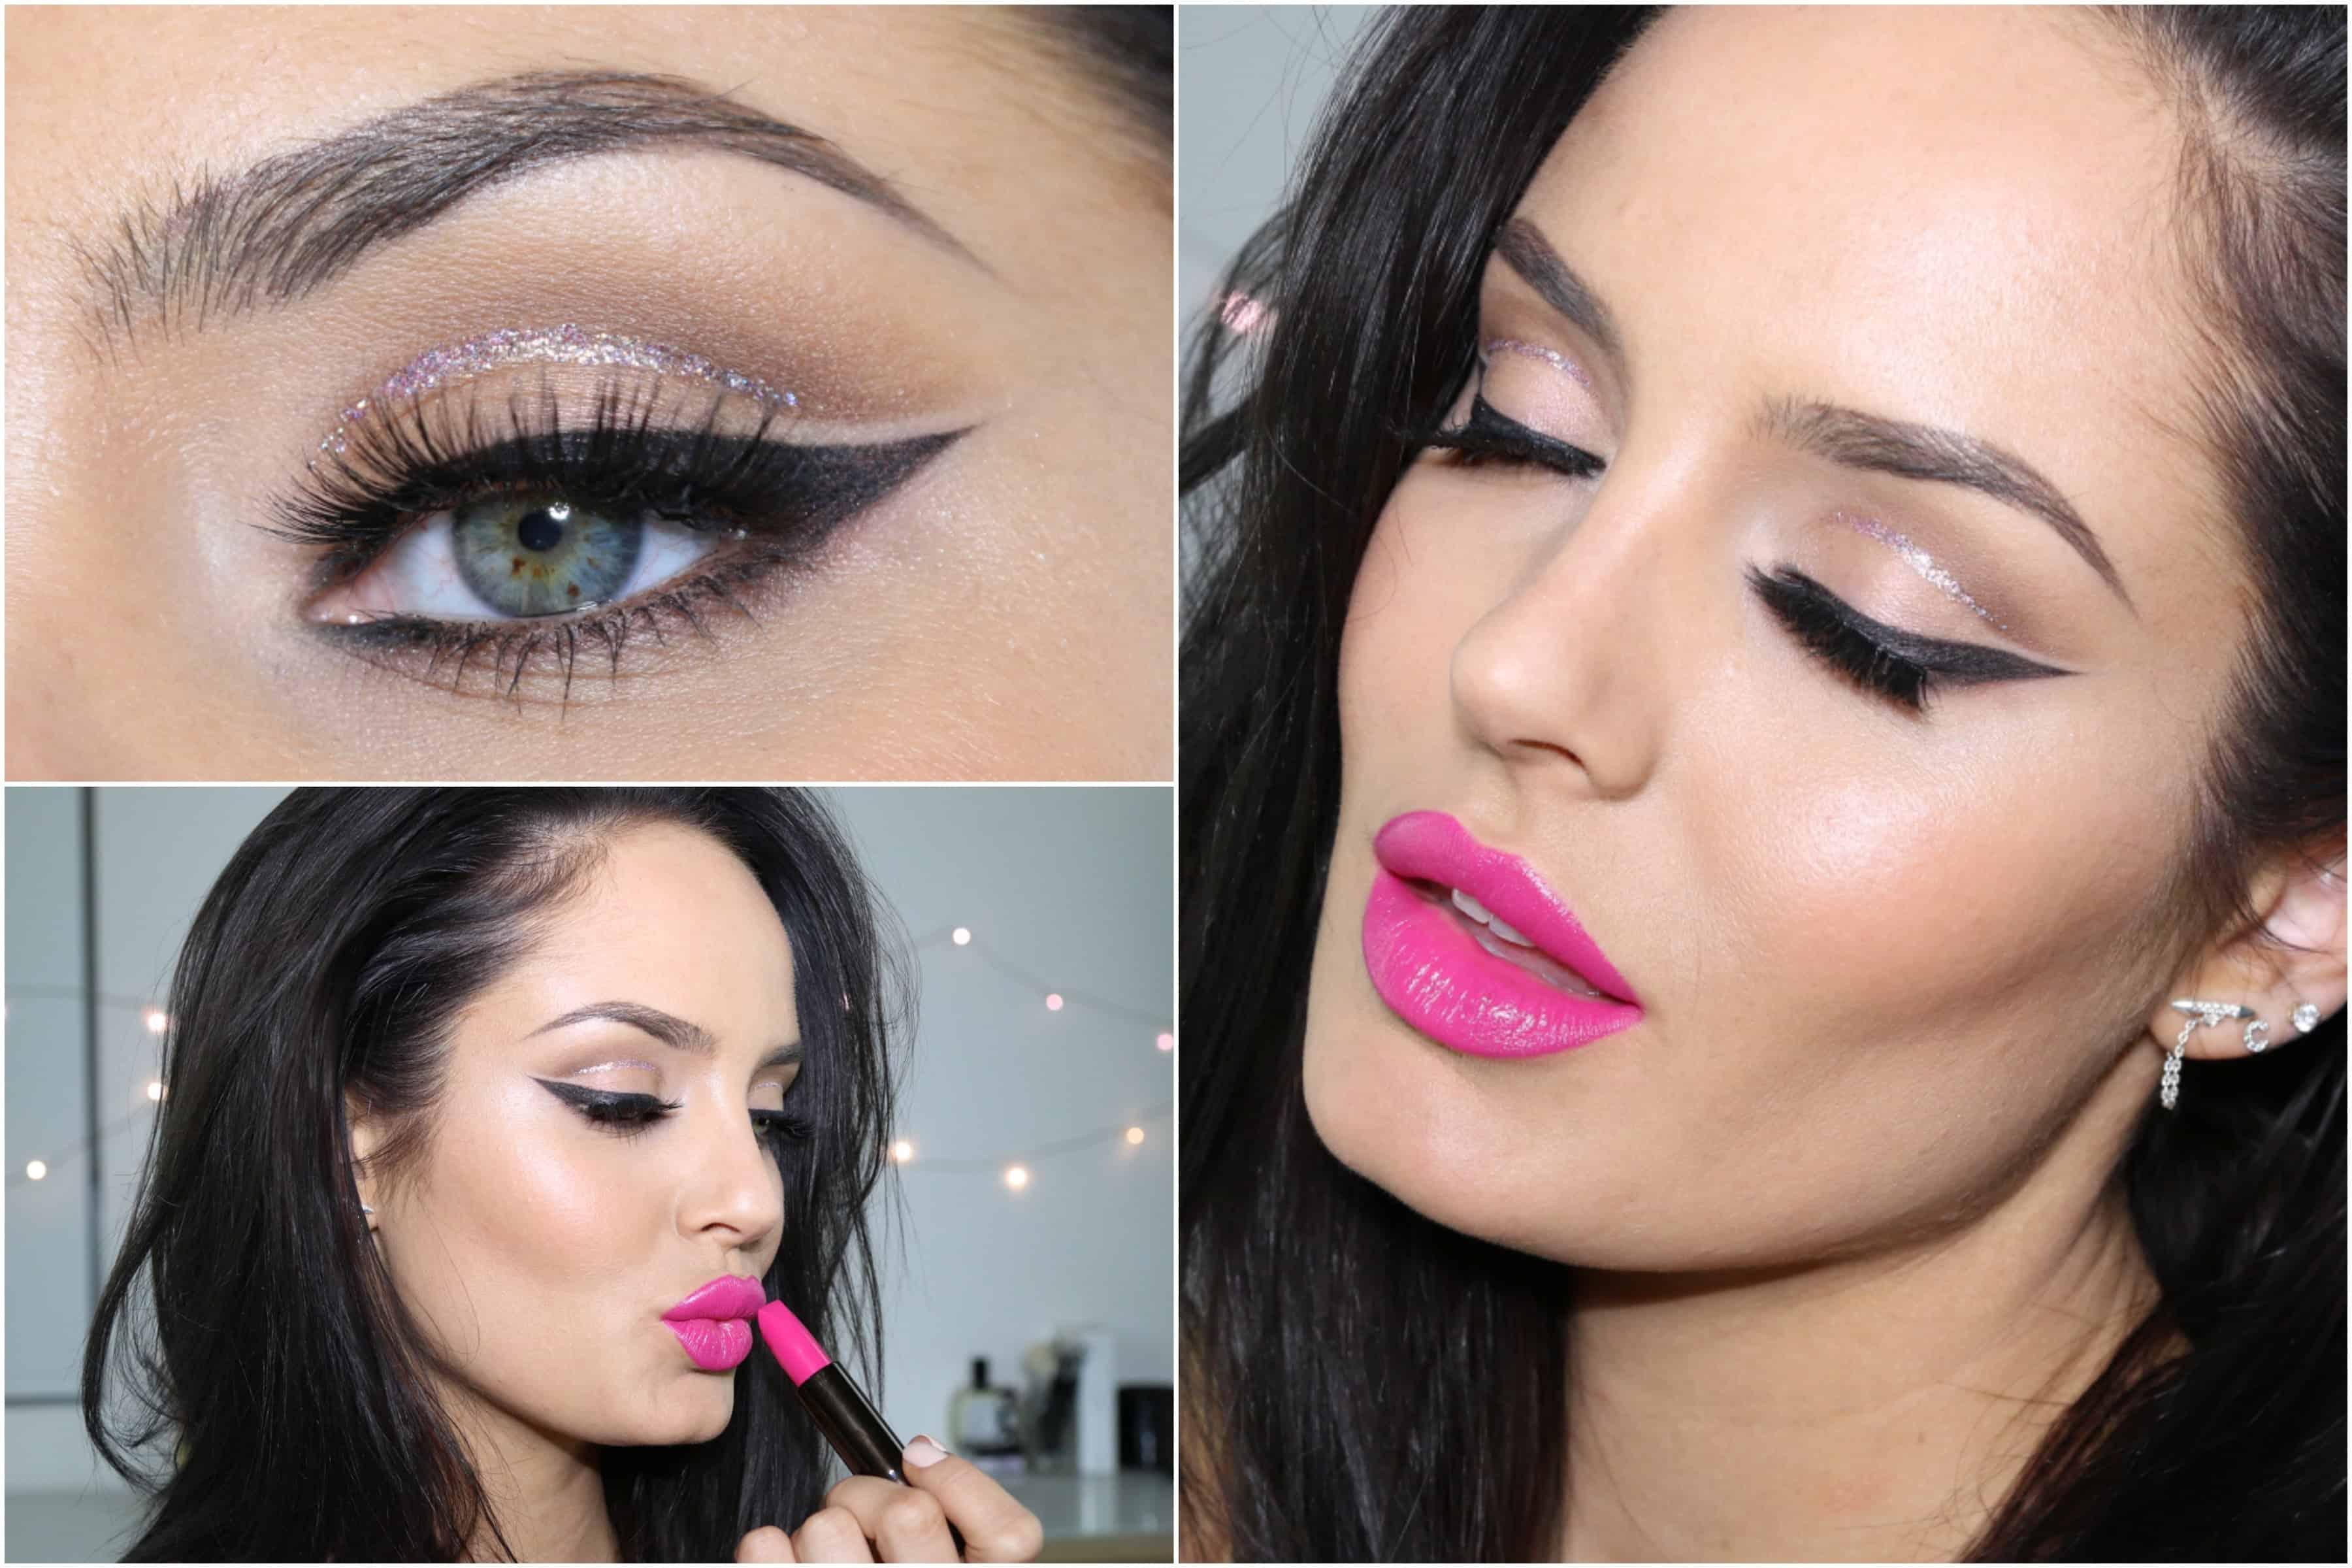 Shiny pink lip